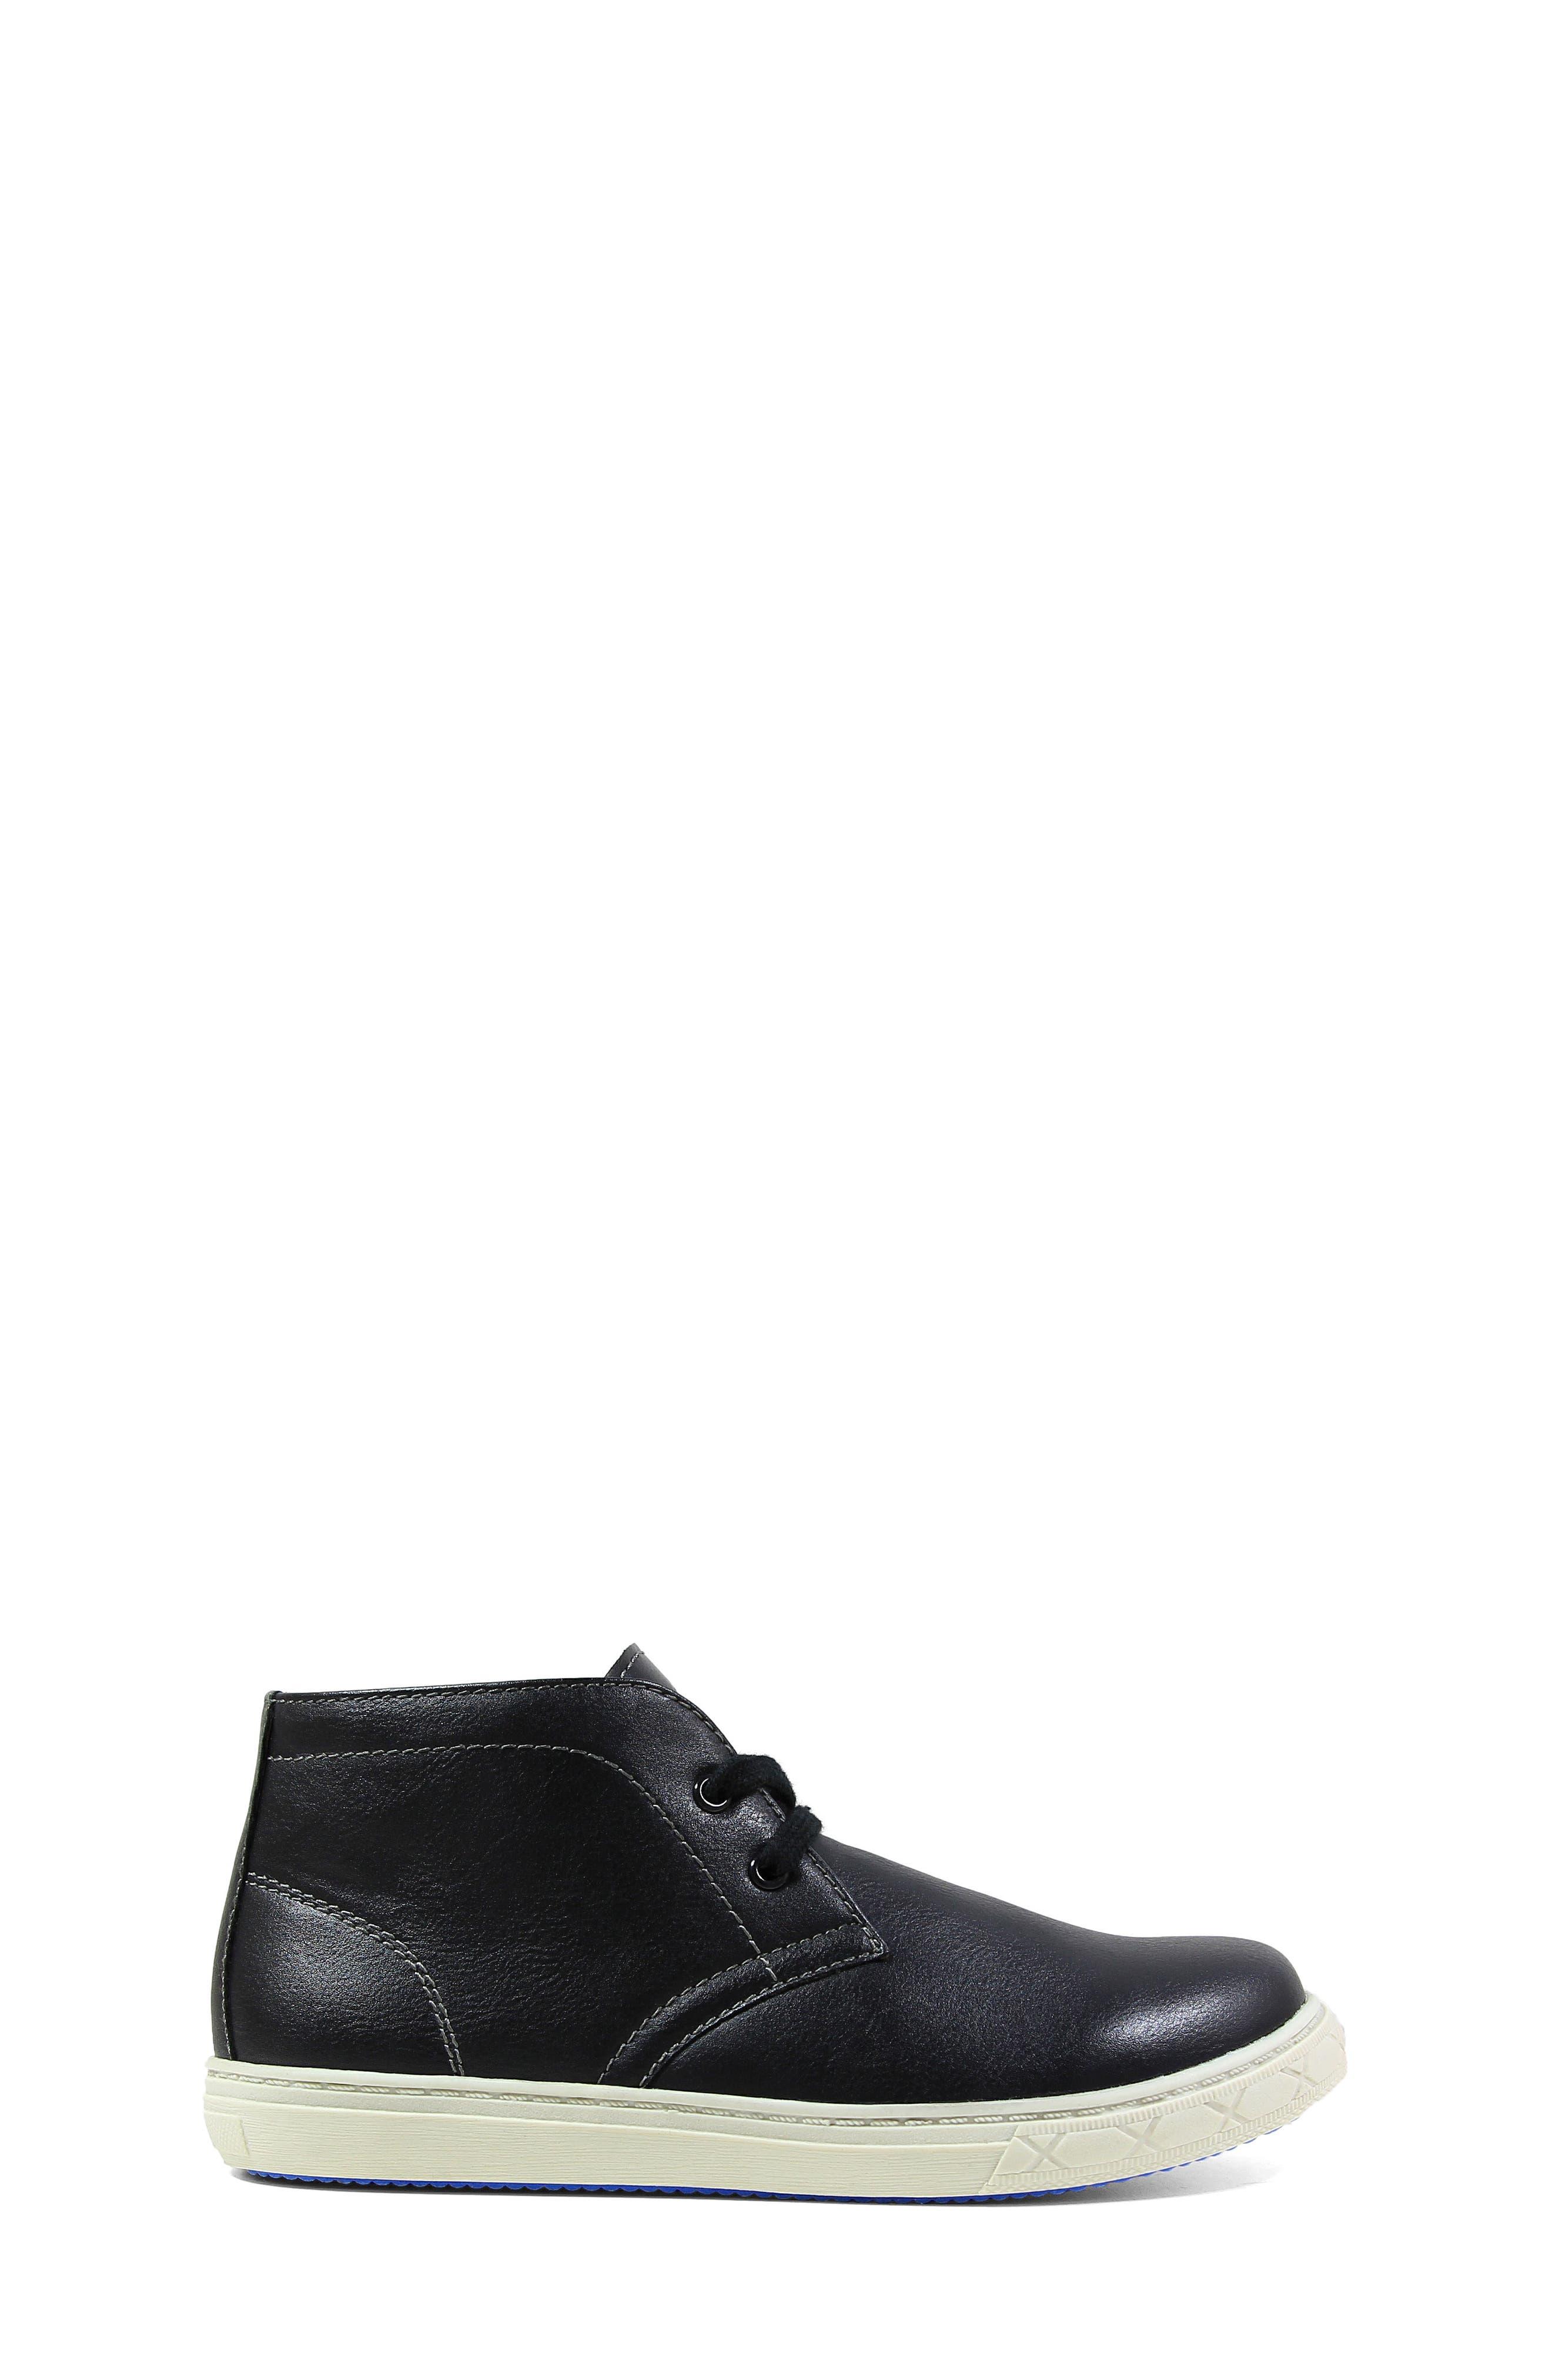 Curb Chukka Sneaker Boot,                             Alternate thumbnail 3, color,                             Black